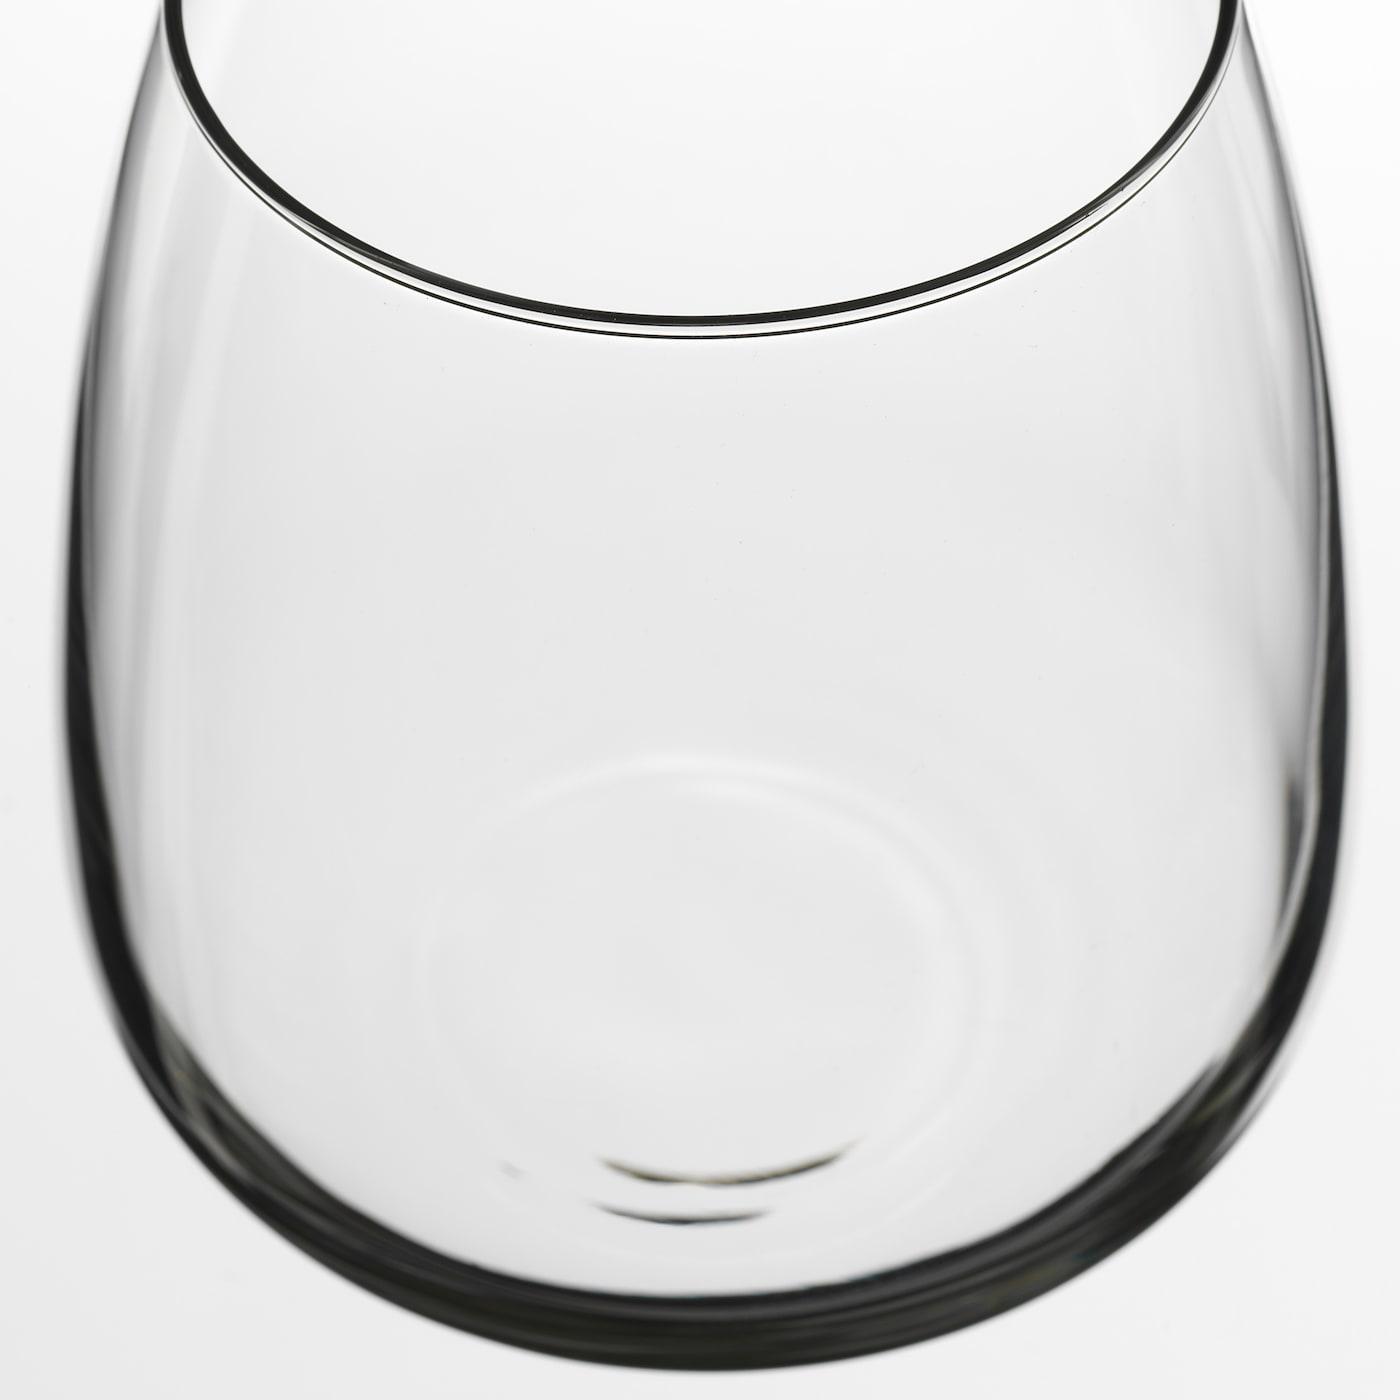 DYRGRIP glas klarglas 9 cm 36 cl